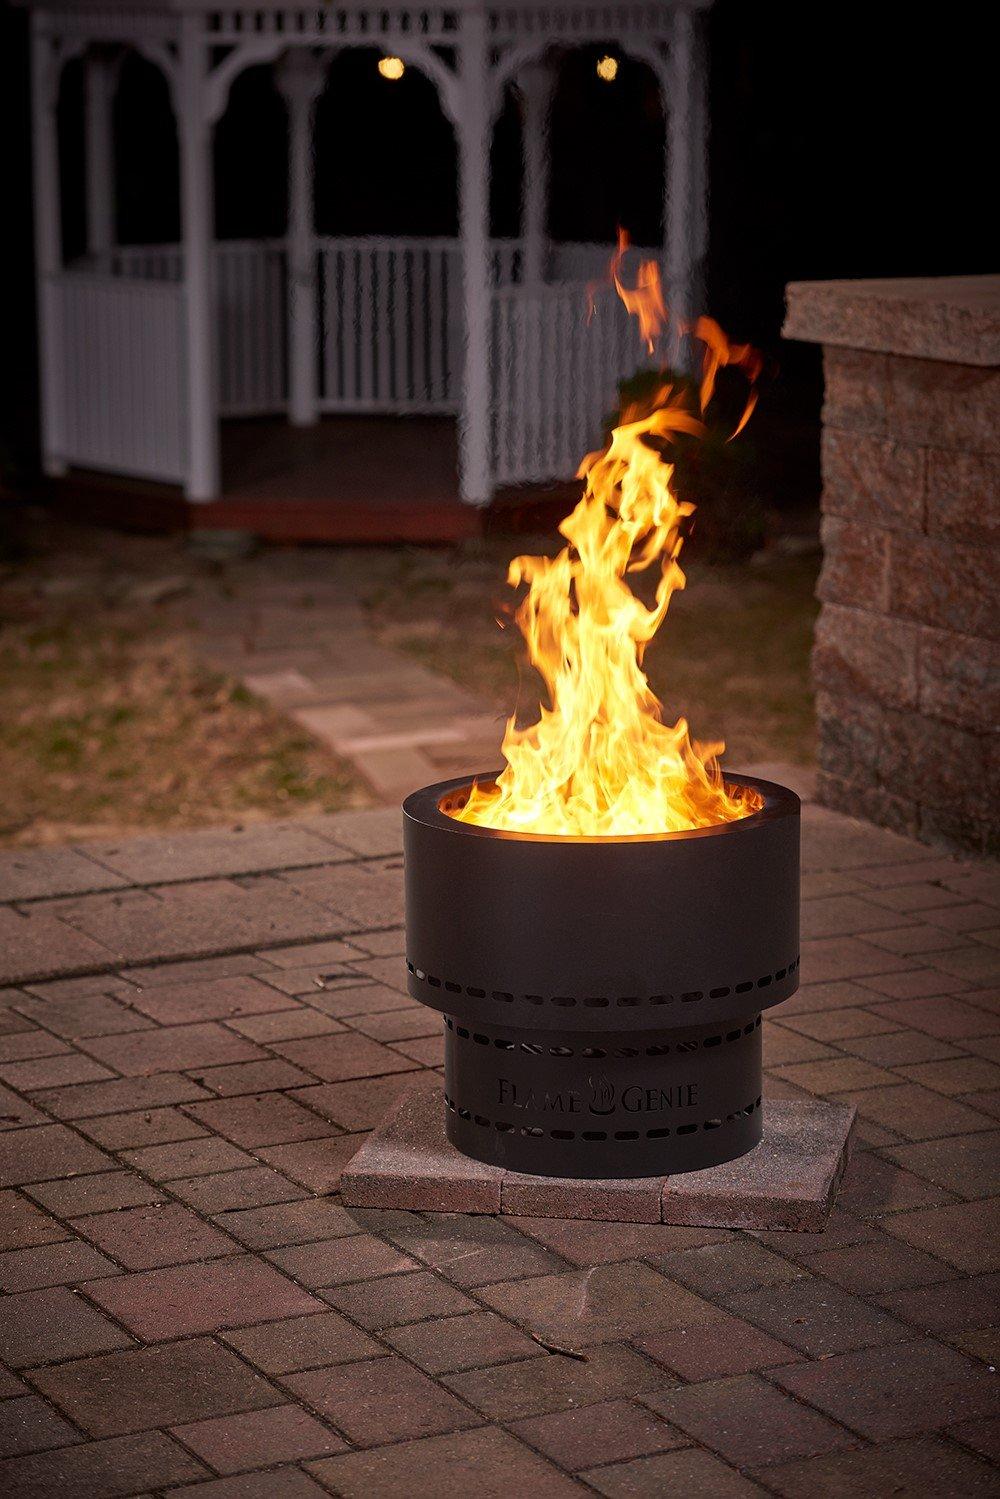 HY-C FG-16 Flame Genie Smoke-Free Spark-Free Portable Wood Pellet Fire Pit